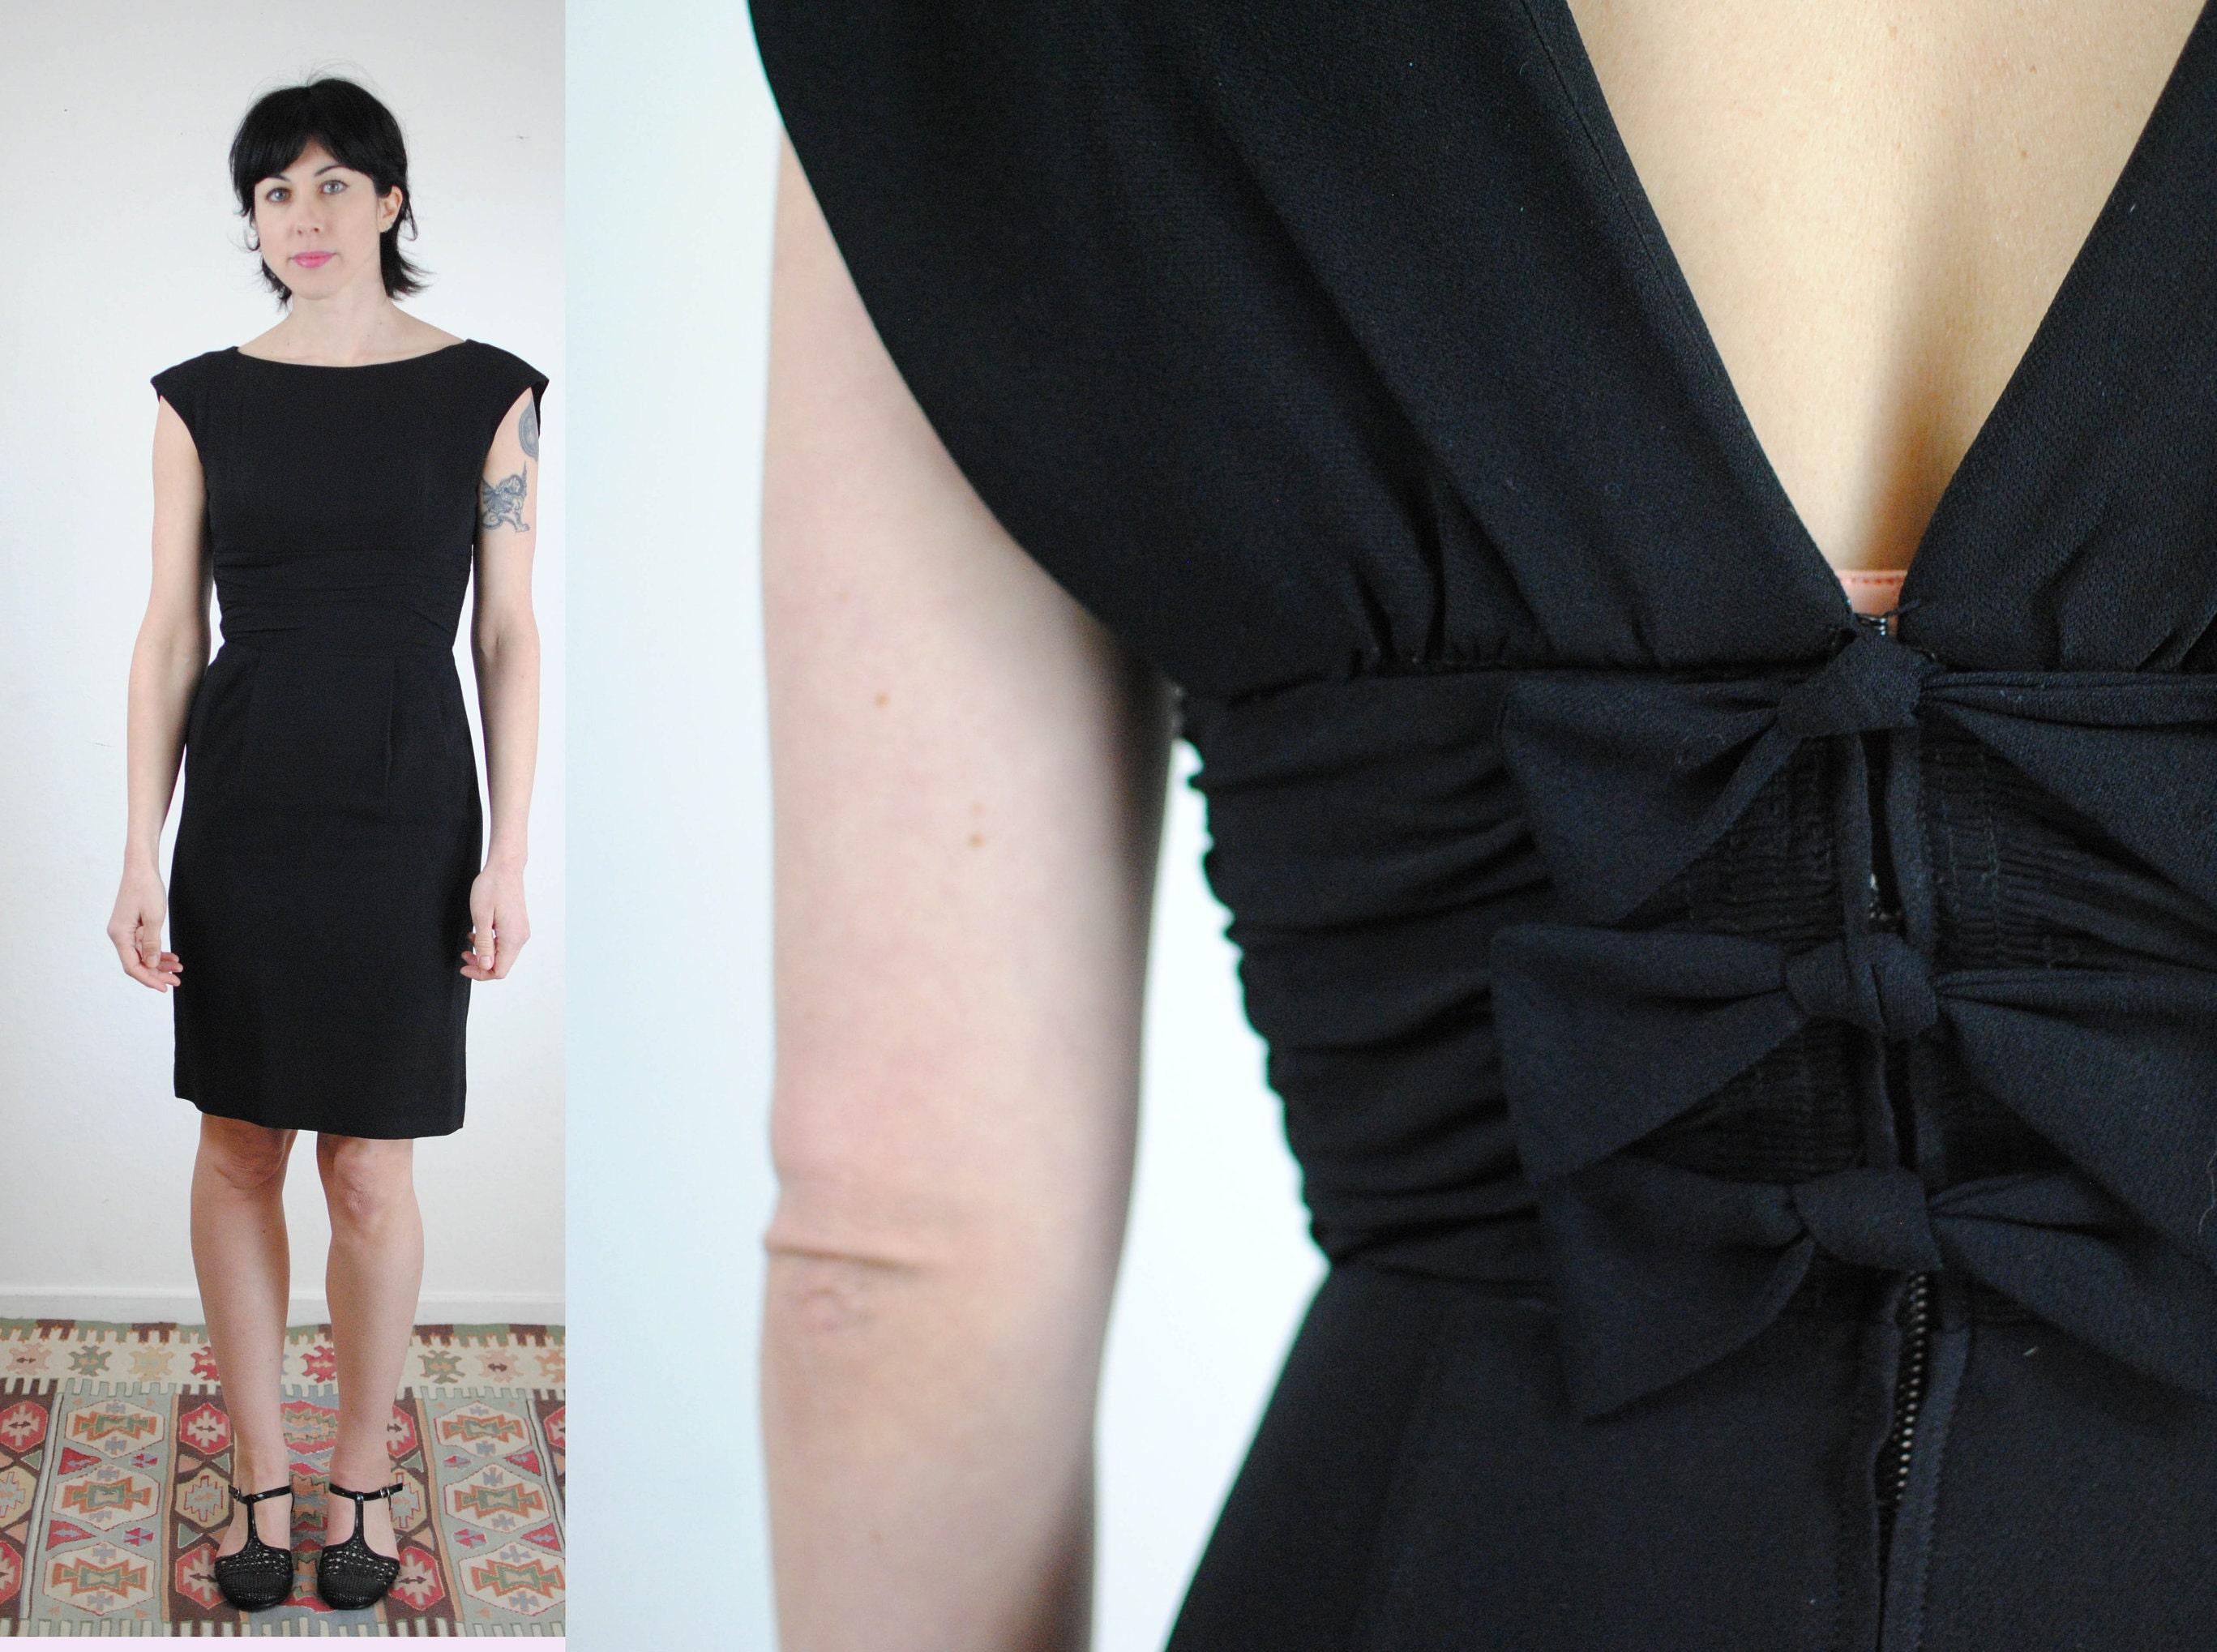 d7e1c3f0e79 Cocktail Dresses Black Tie - Gomes Weine AG